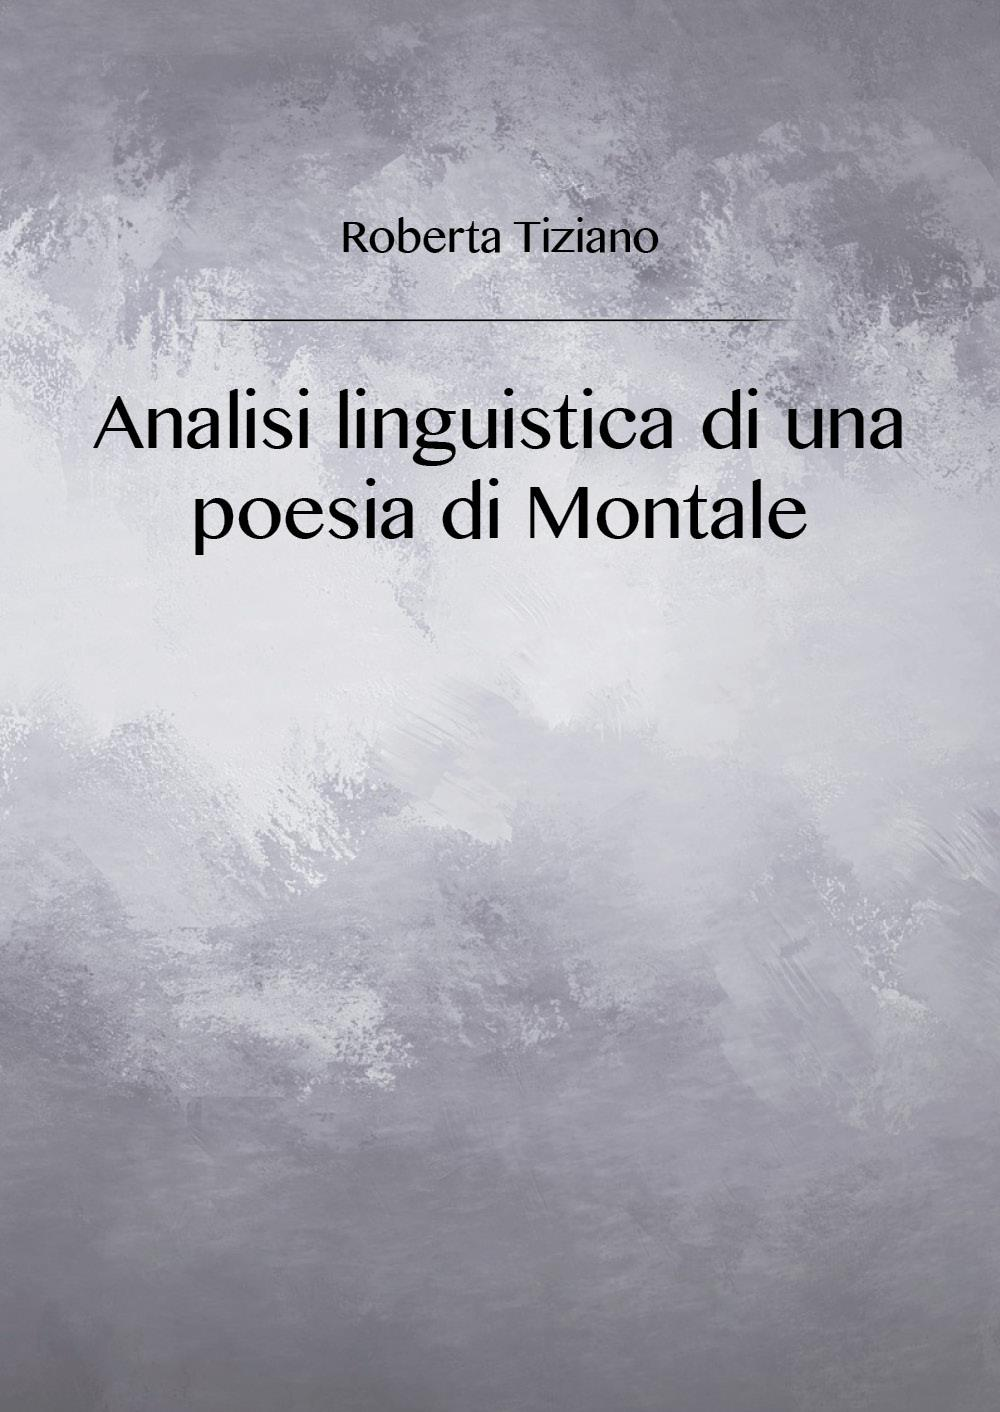 Analisi linguistica di una poesia di Montale